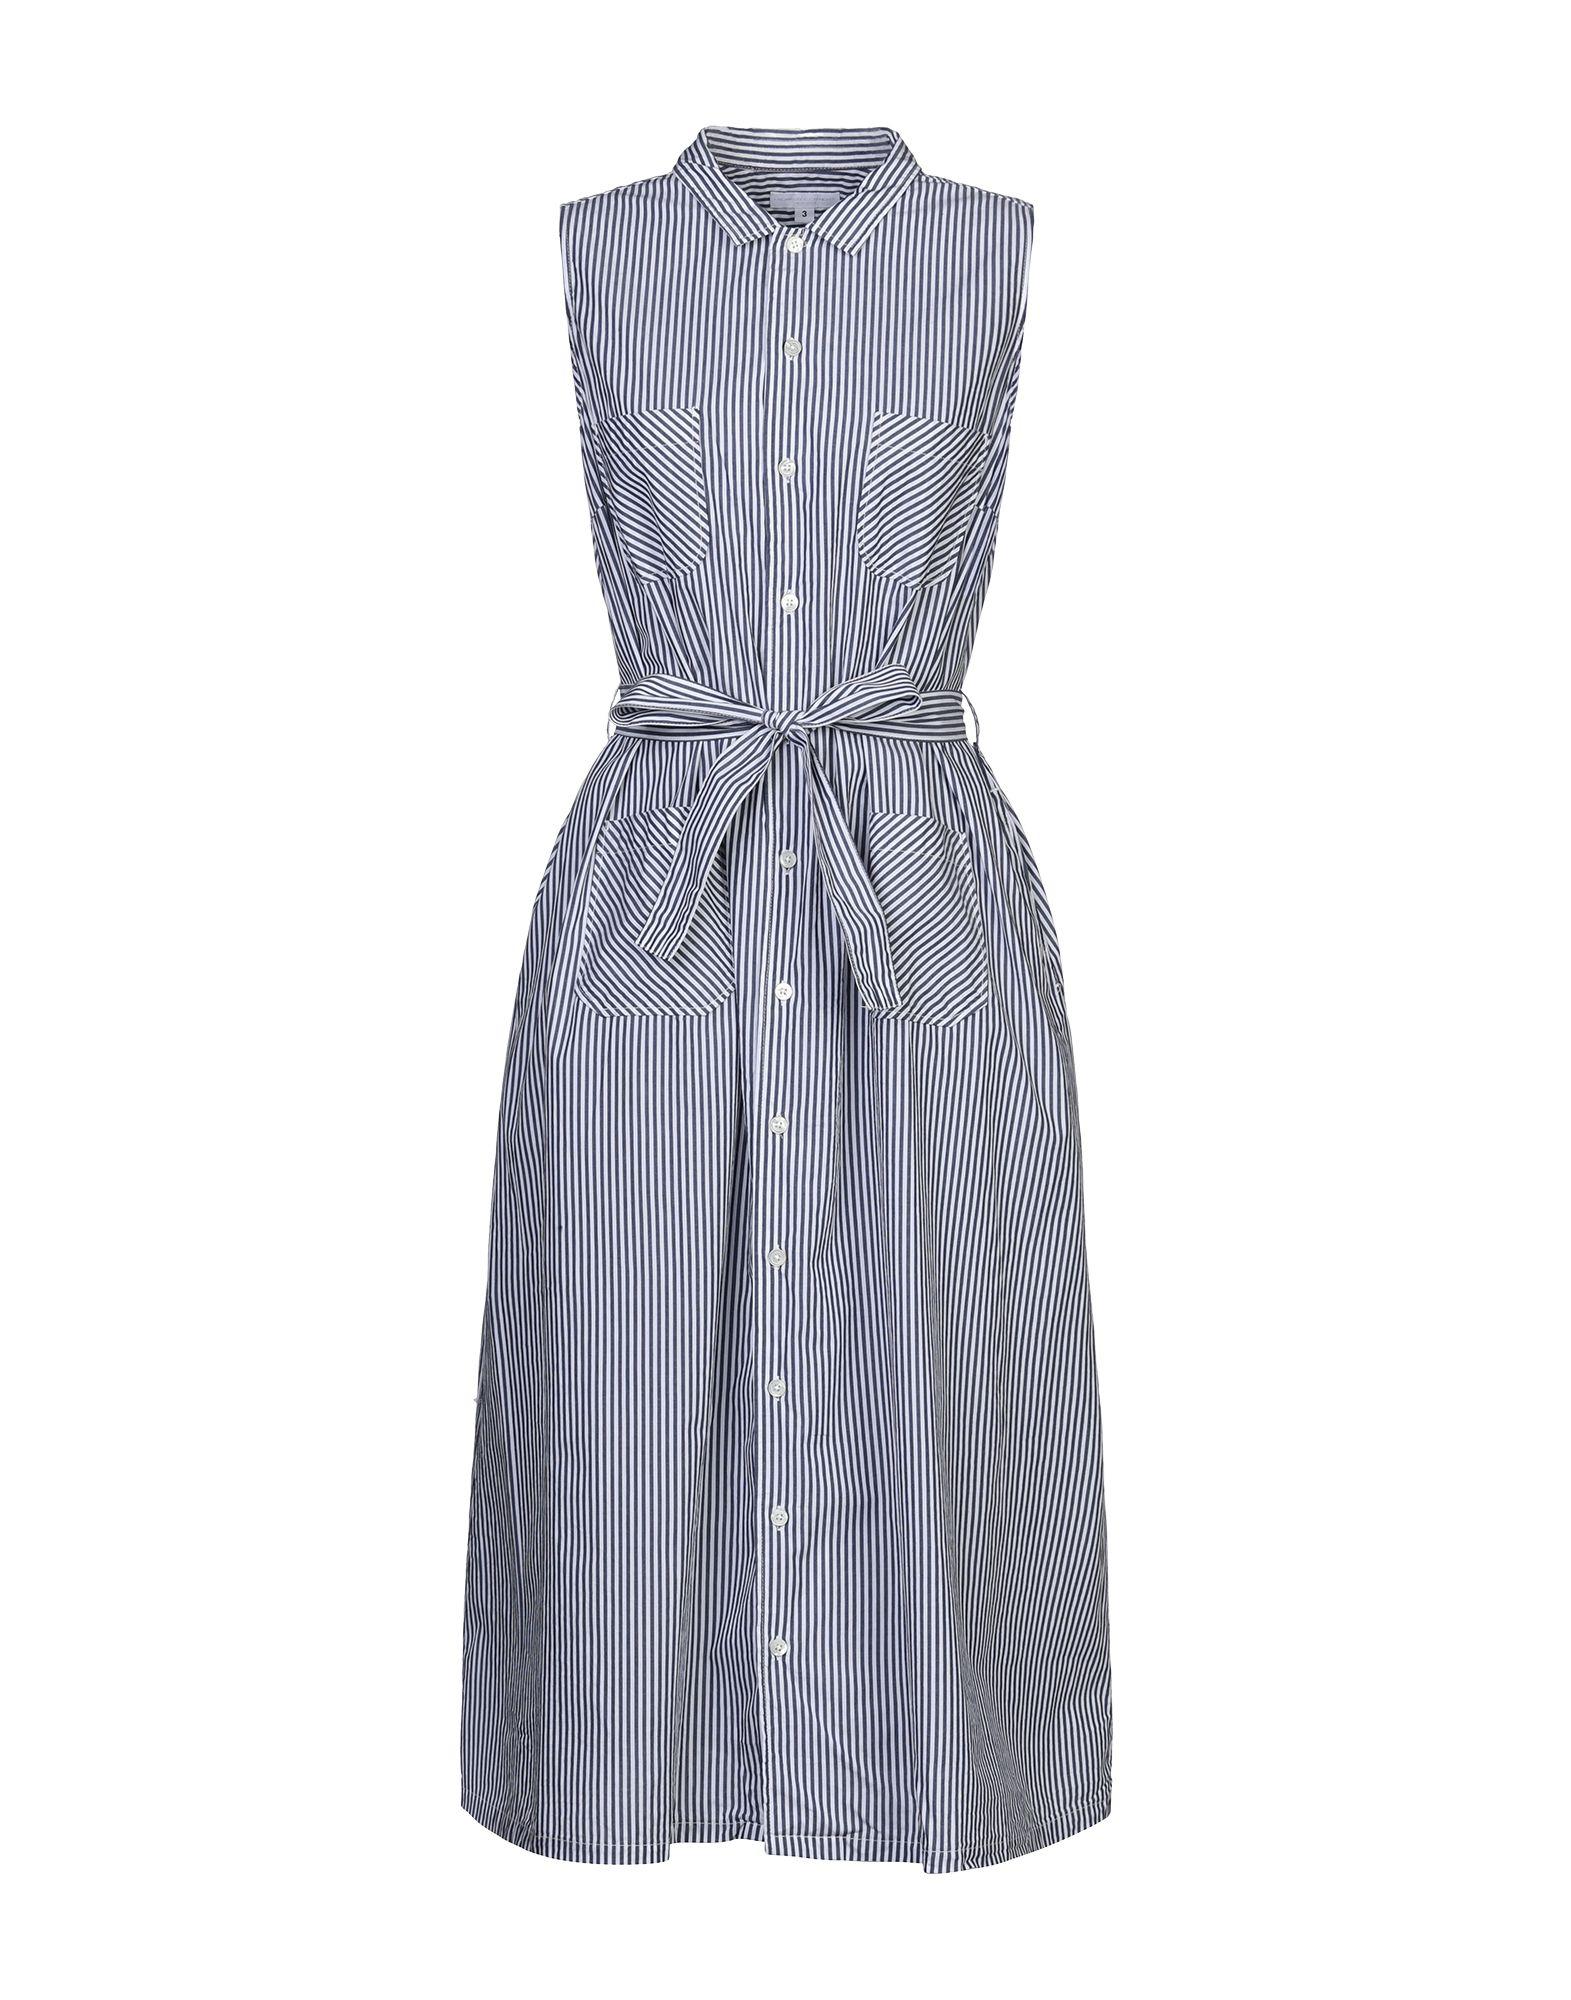 ENGINEERED GARMENTS Платье длиной 3/4 f w k engineered garments куртка